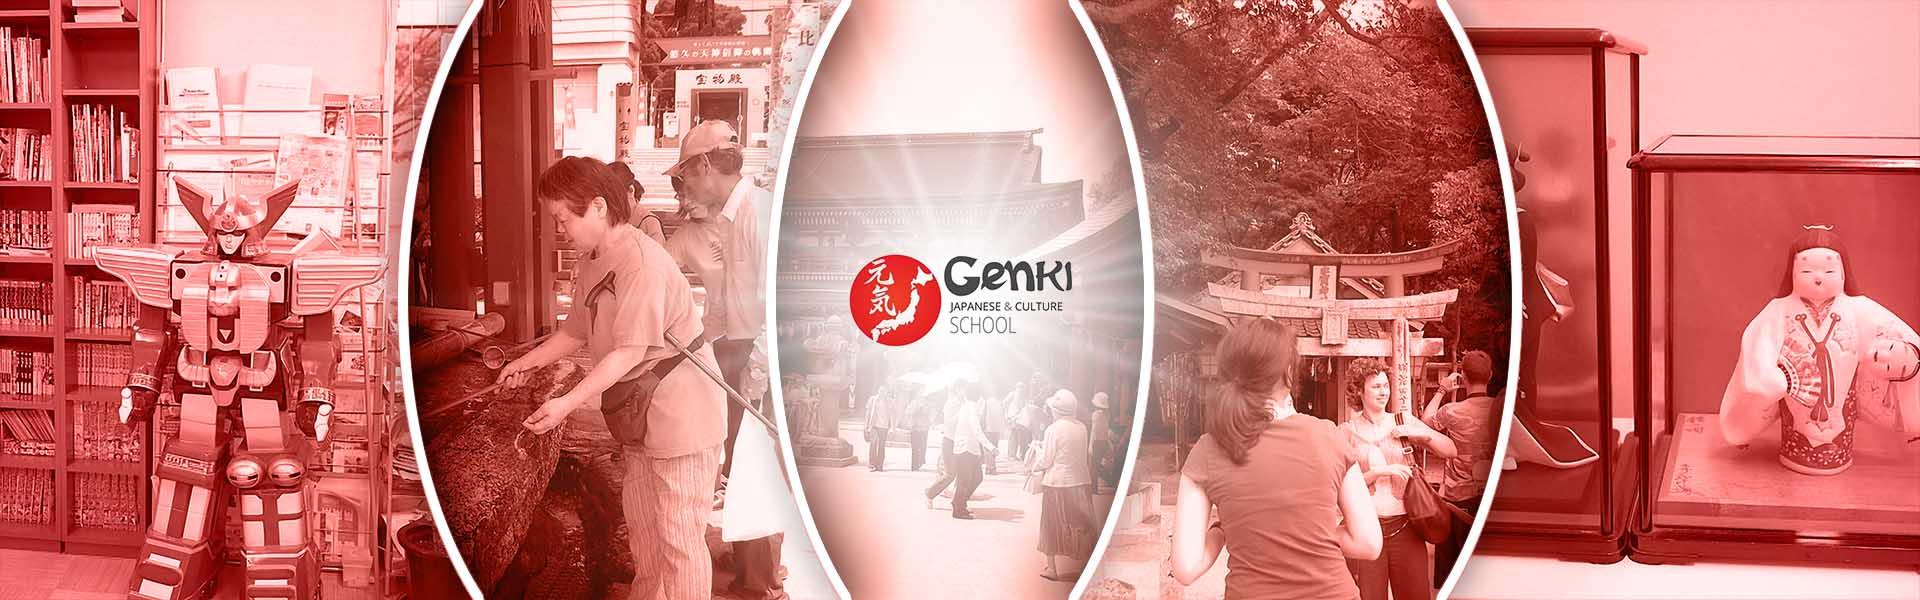 Genki Fukuoka Dil Okulu